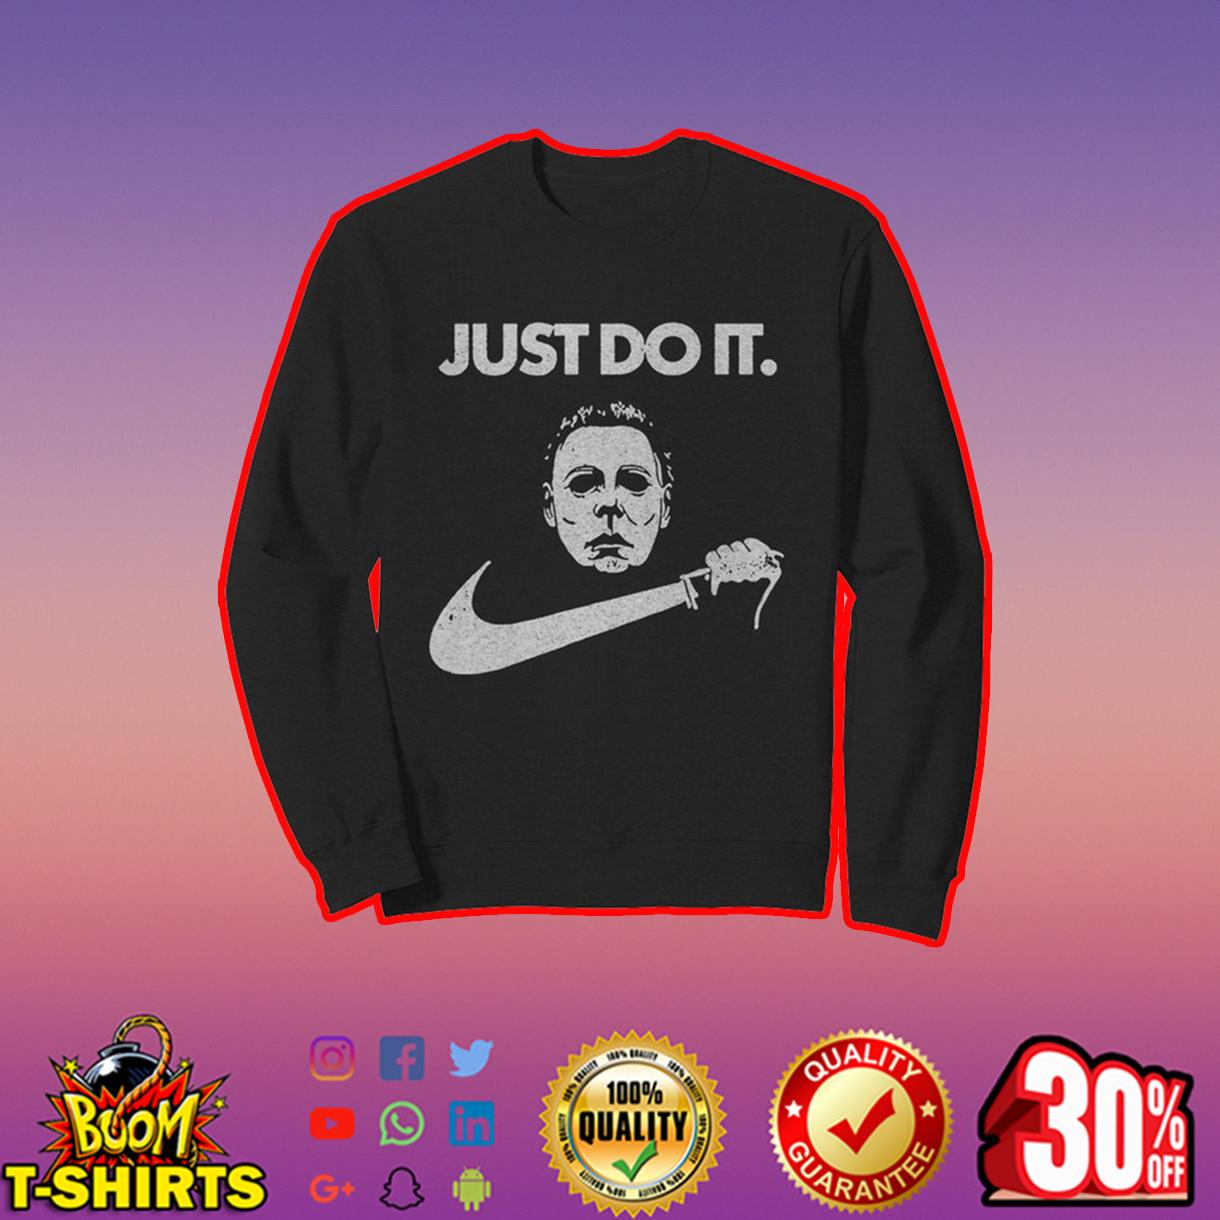 Just do it Michael Myers sweatshirt